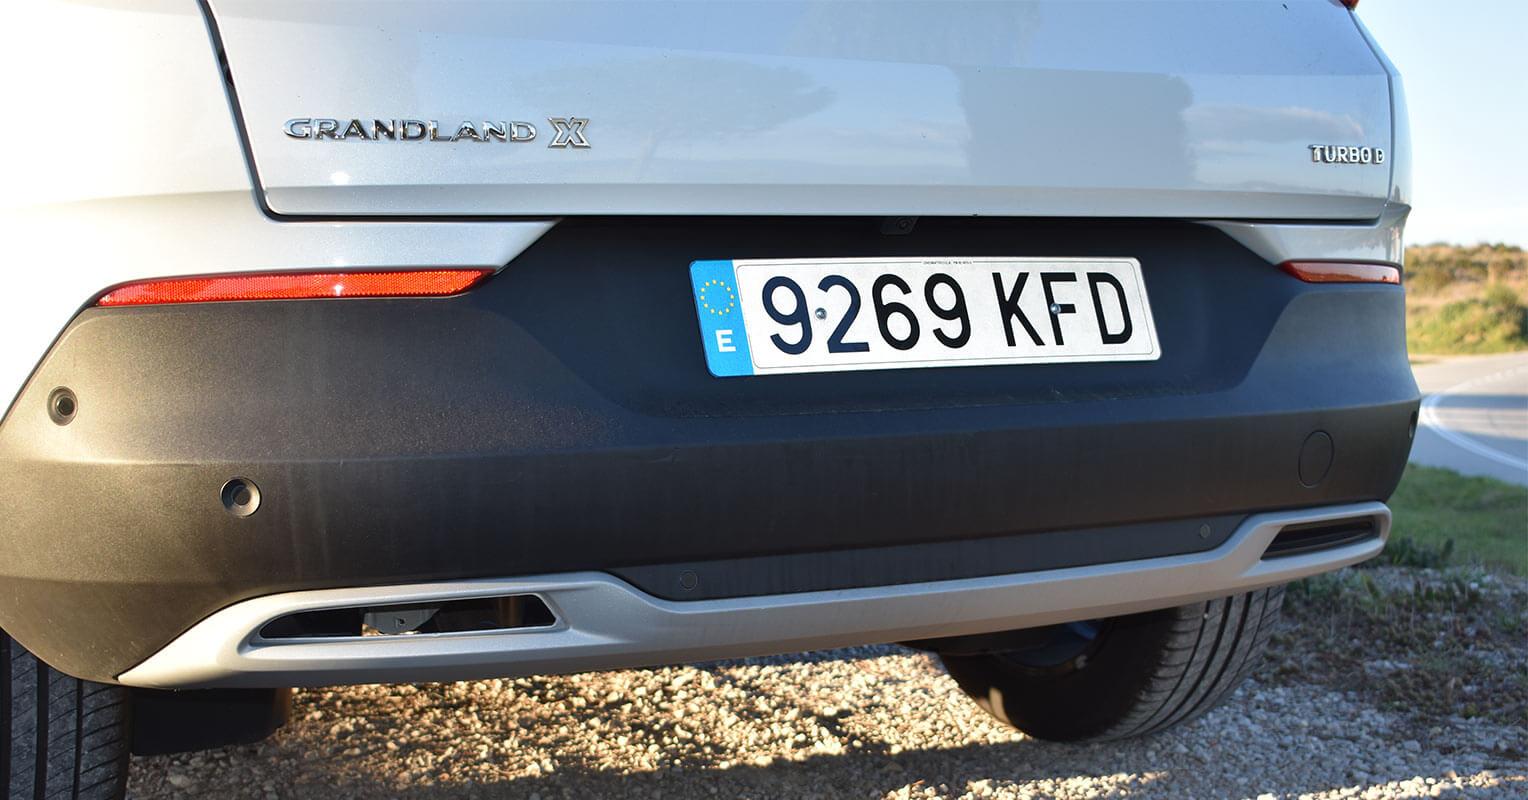 Difusor trasero del Opel Grandland X